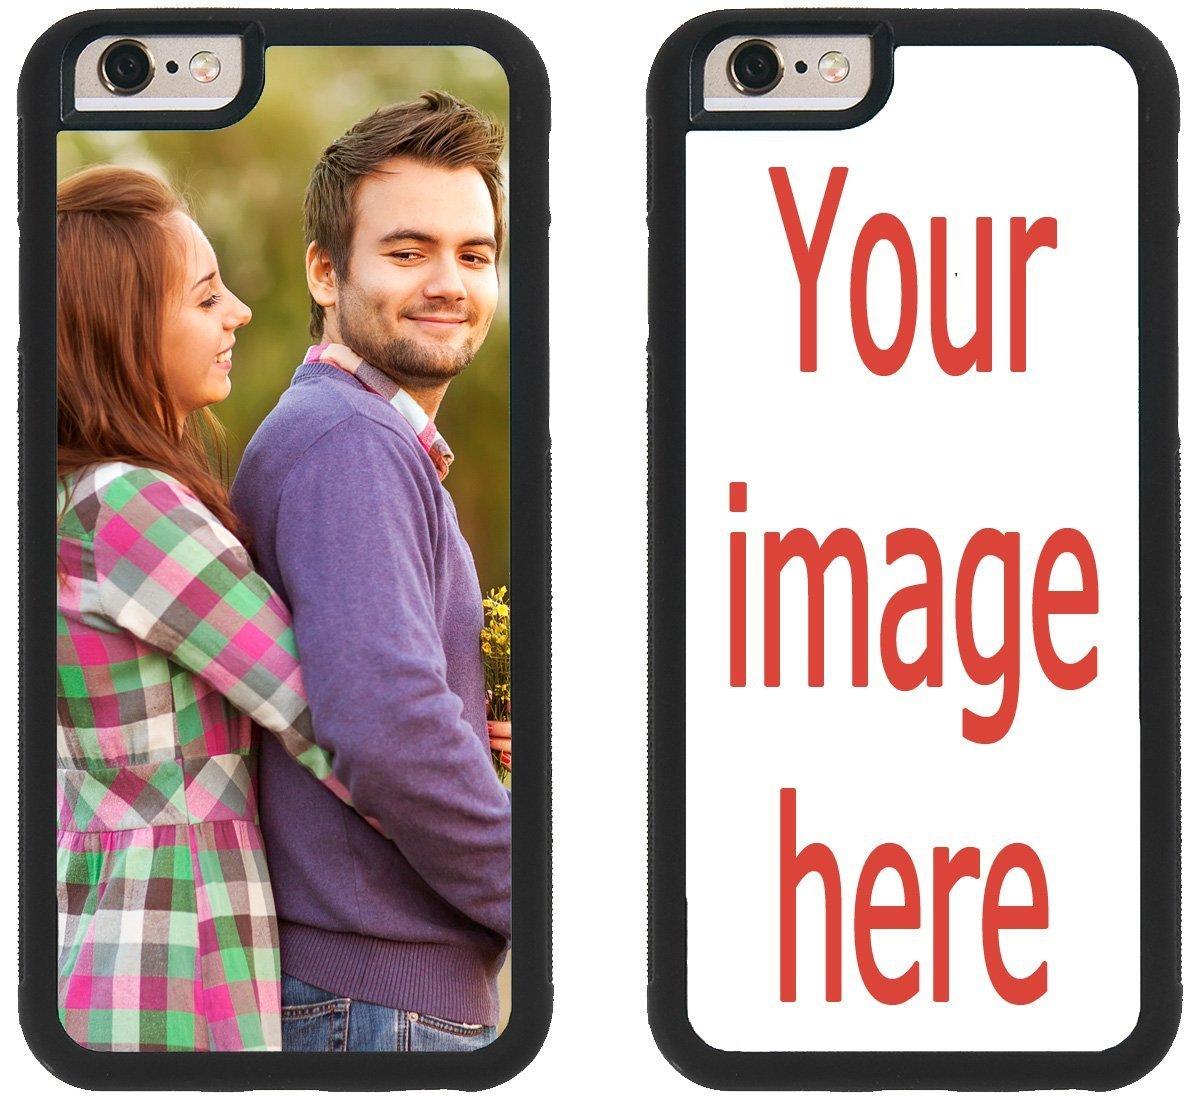 wholesale dealer 56186 d3b70 Custom iPhone Cases iPhone 7 Plus, iPhone 8 Plus iZERCASE [Personalized  Custom Picture CASE] Make Your Own Phone Case (Black)